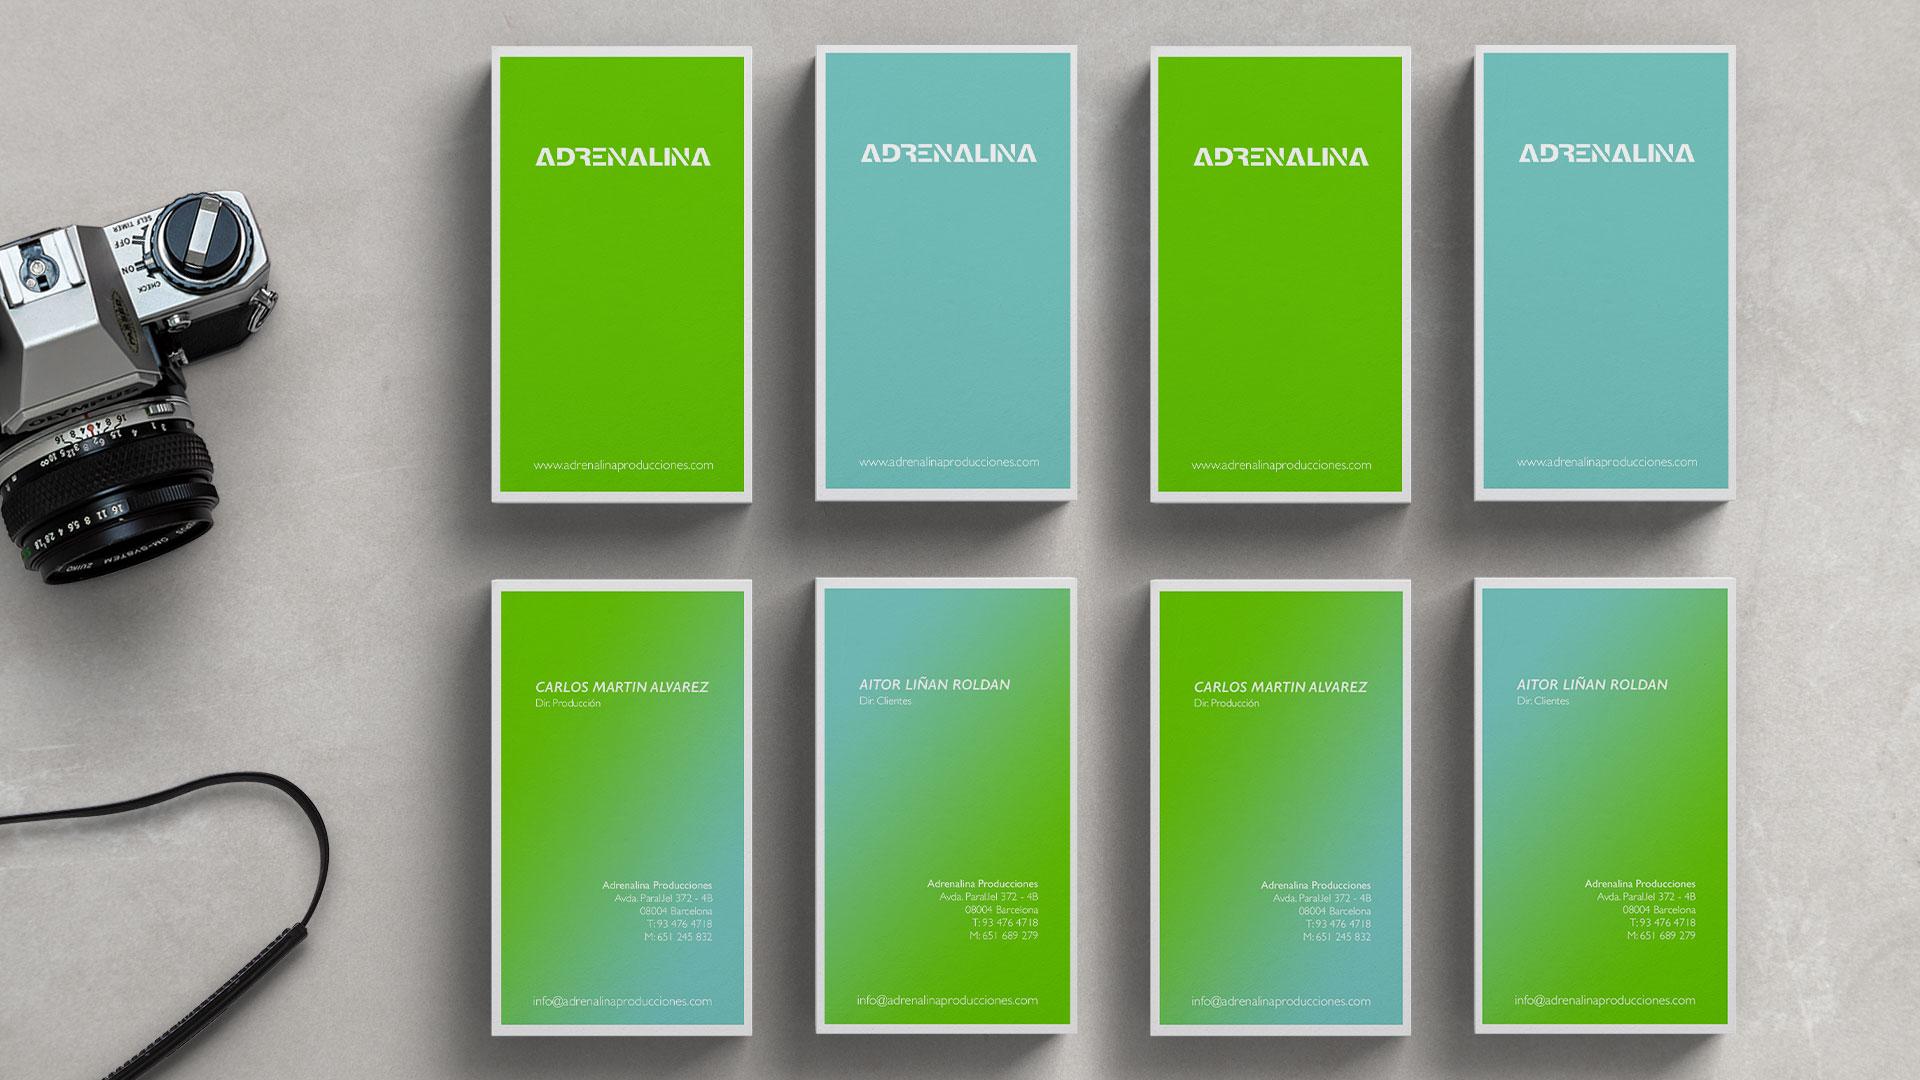 adrenalina_branding_identity_5